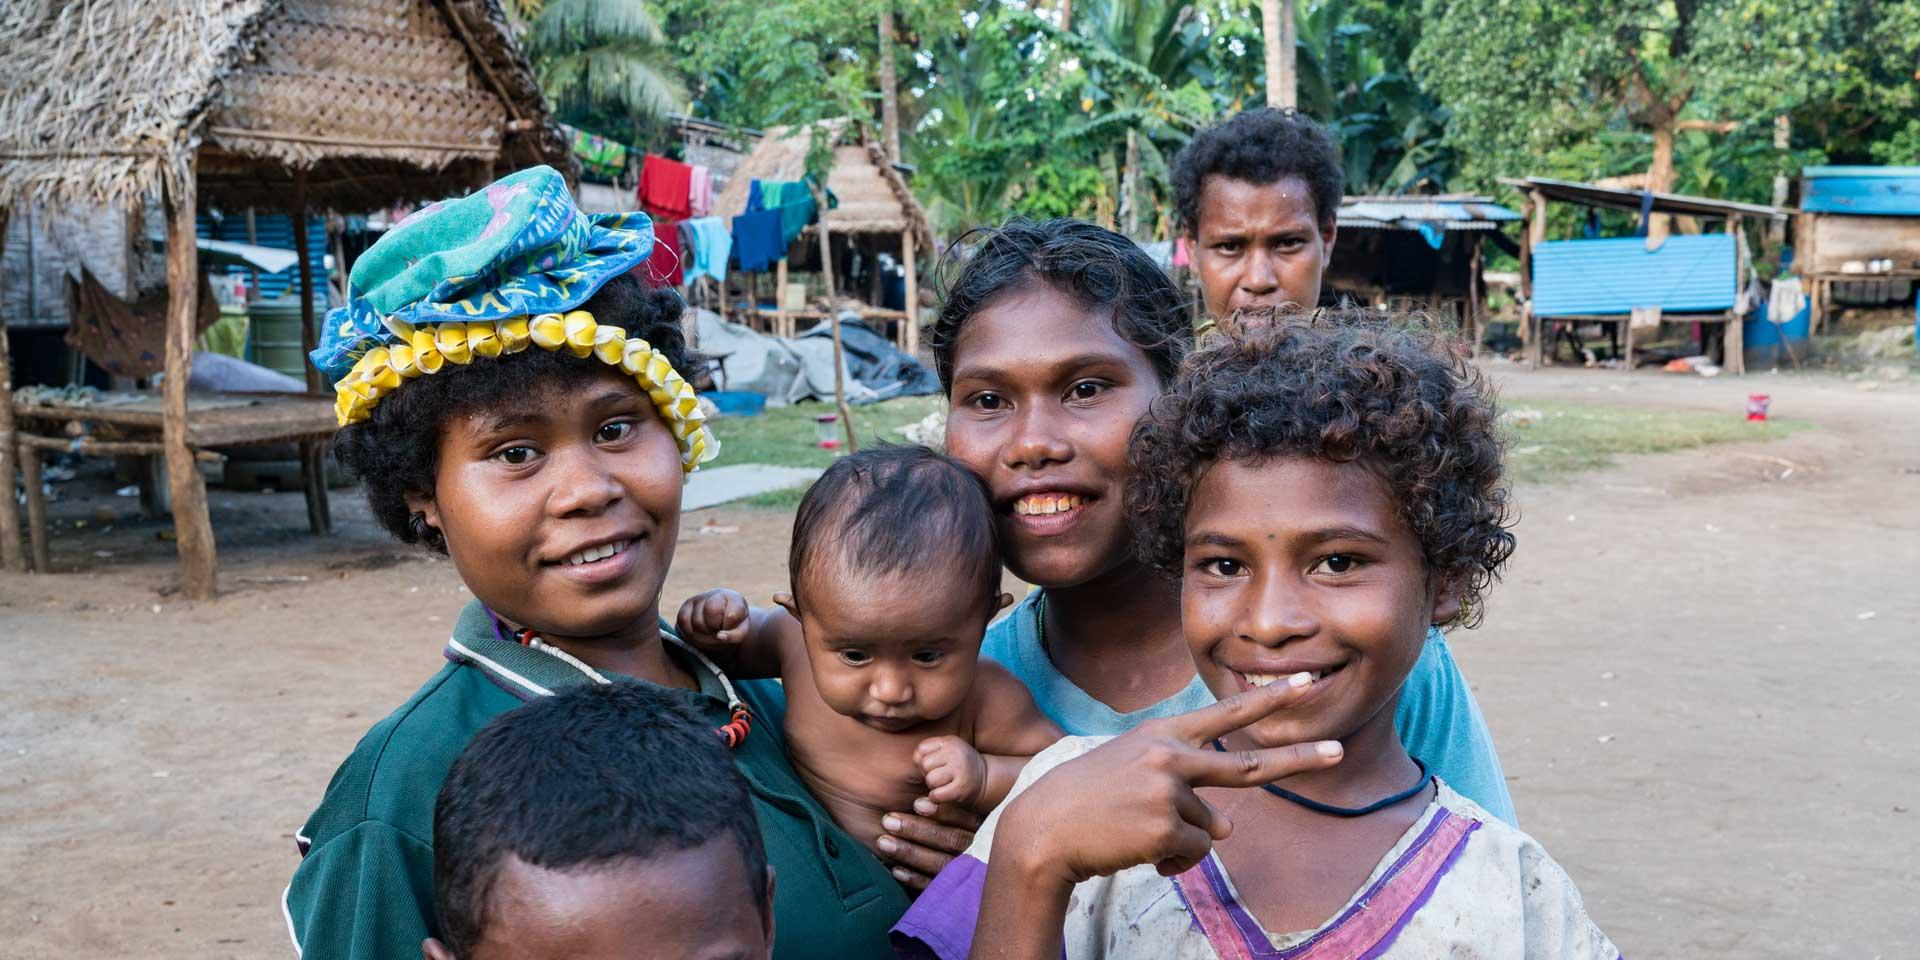 300 Days of Sunshine Light Up Papua New Guinea\'s Future.